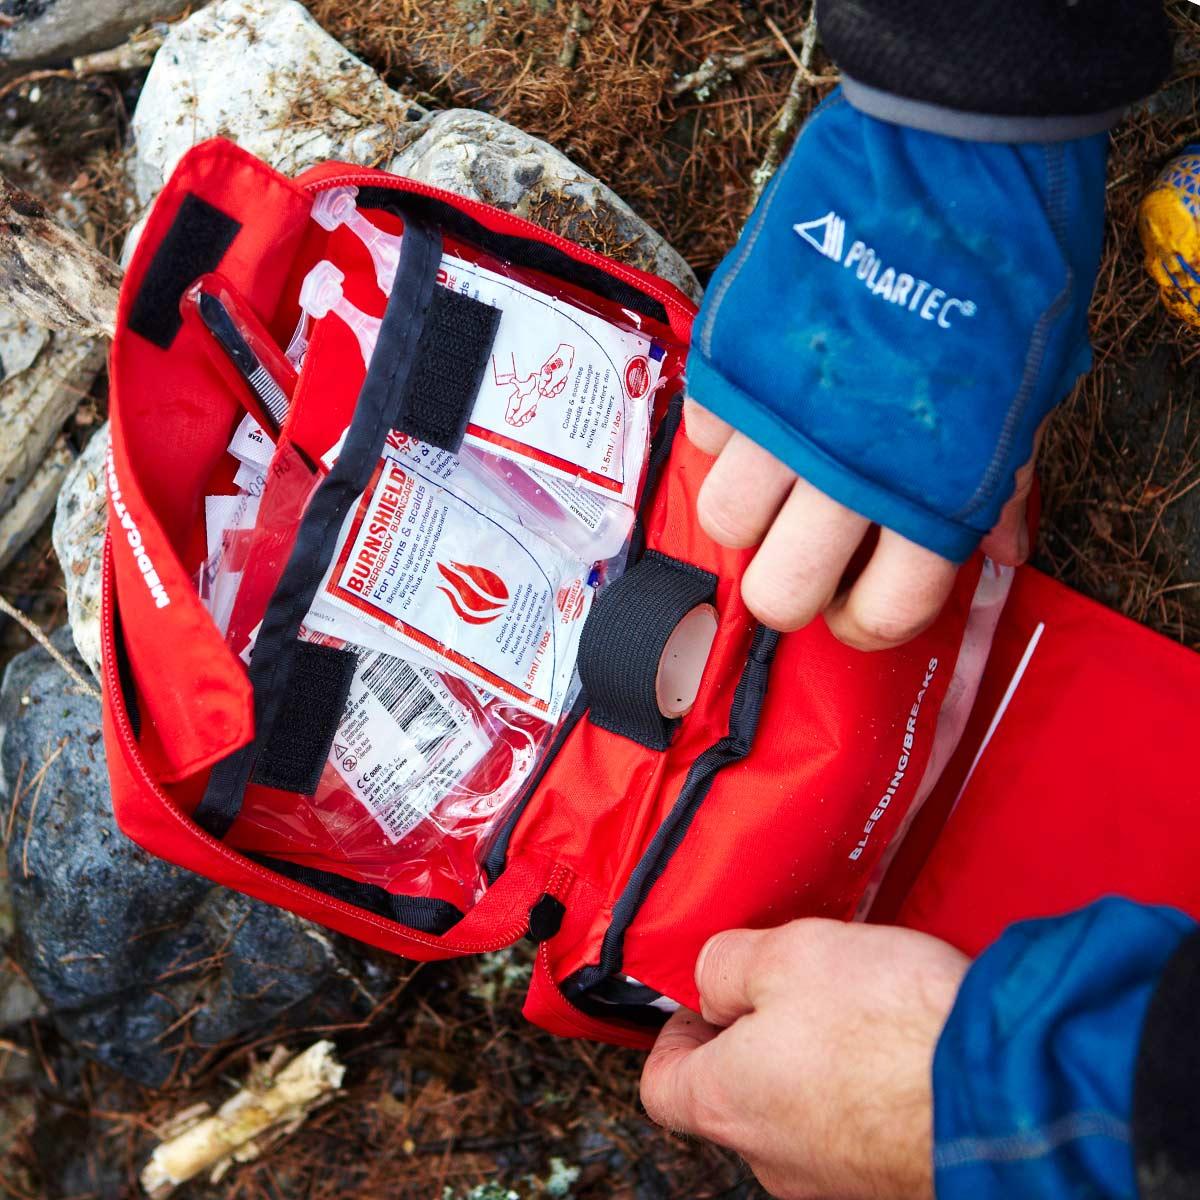 Damavand Climbing Kit